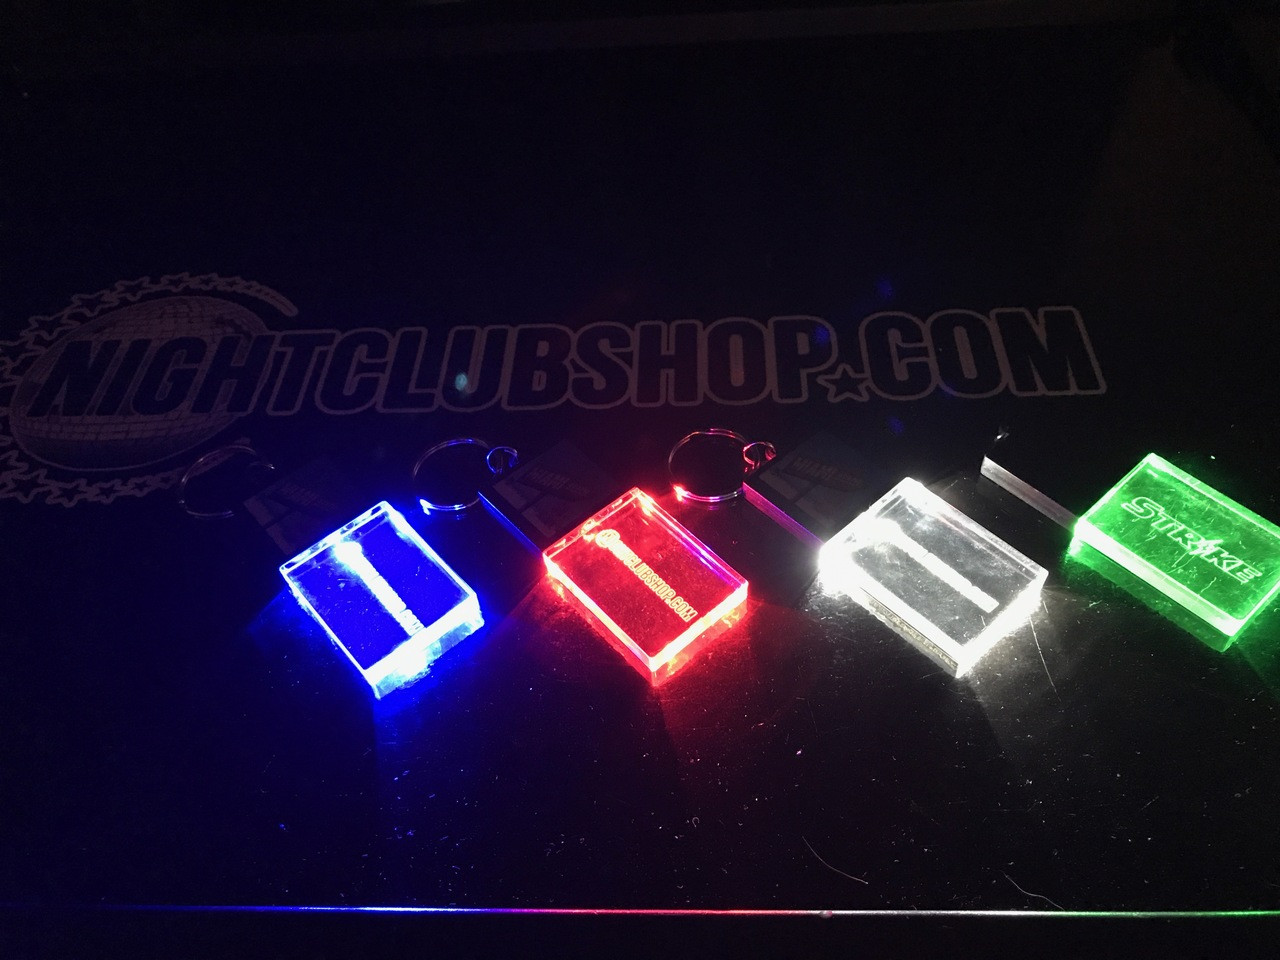 Light up,LED,Keychain,Key,chain,LED keychain, custom, BEAM, dual, print,engraved, logo,text, laser engraved,personalized,promo,merch,fundraiser,nightclub,fund raiser